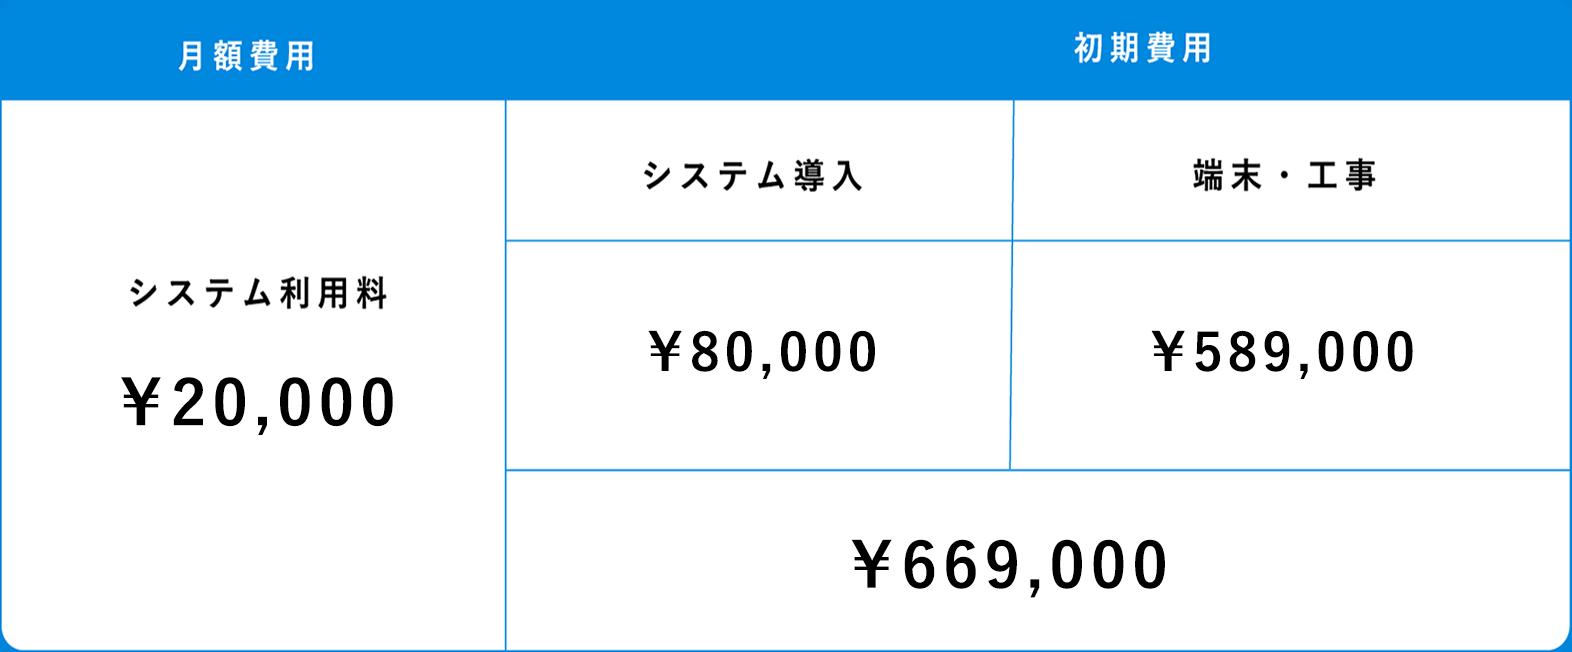 https://3daikan.com/assets/landing/board_price/PC.png